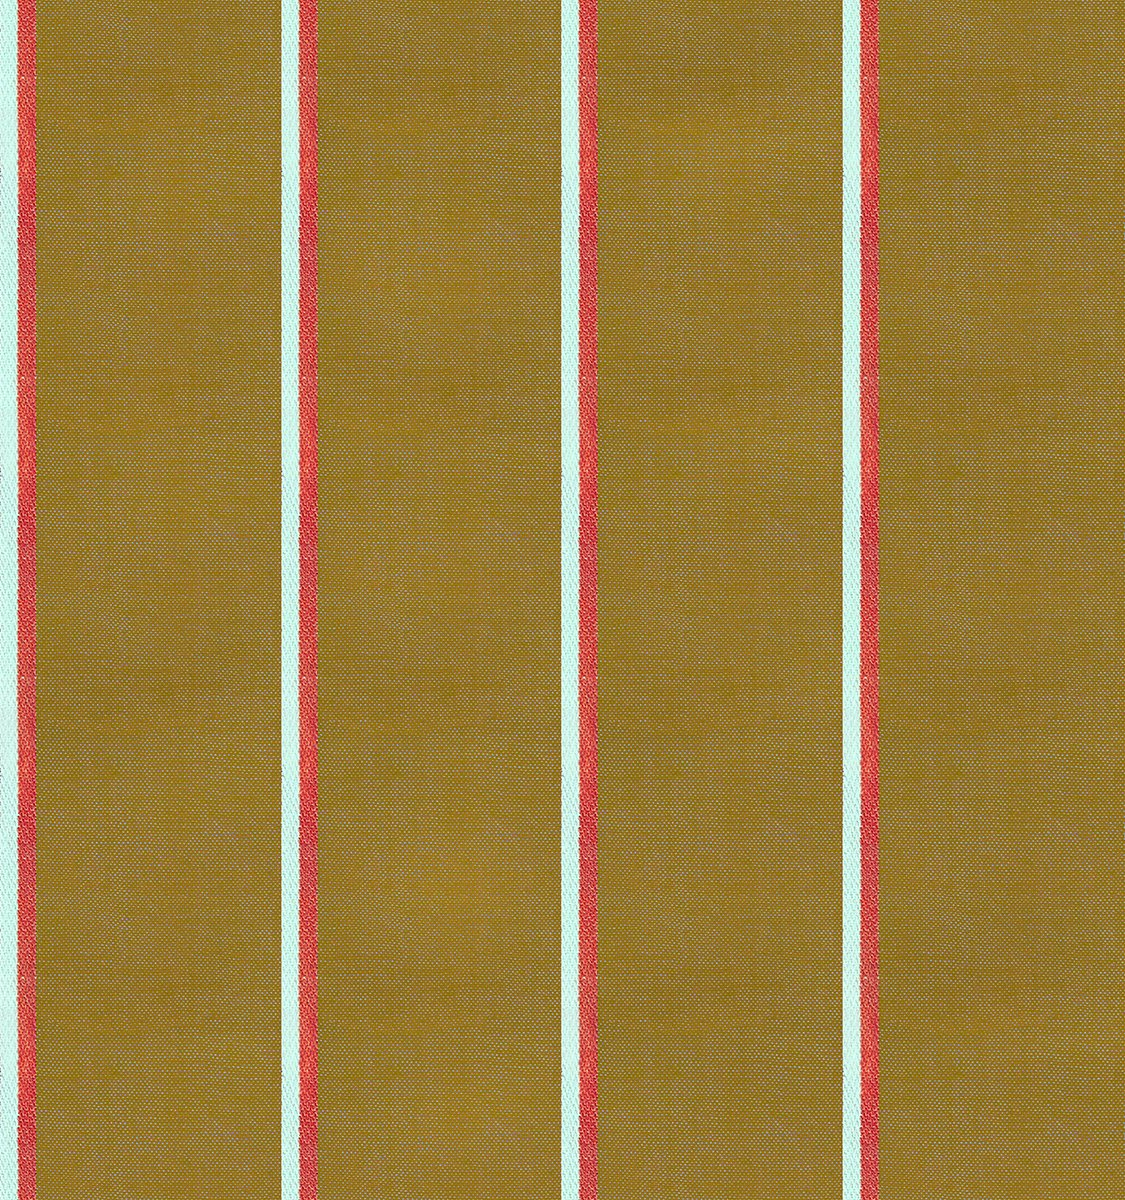 Ruby Star Society Warp & Weft Heirloom Yarn-Dyed Wovens - Linework Lightweight - Suede